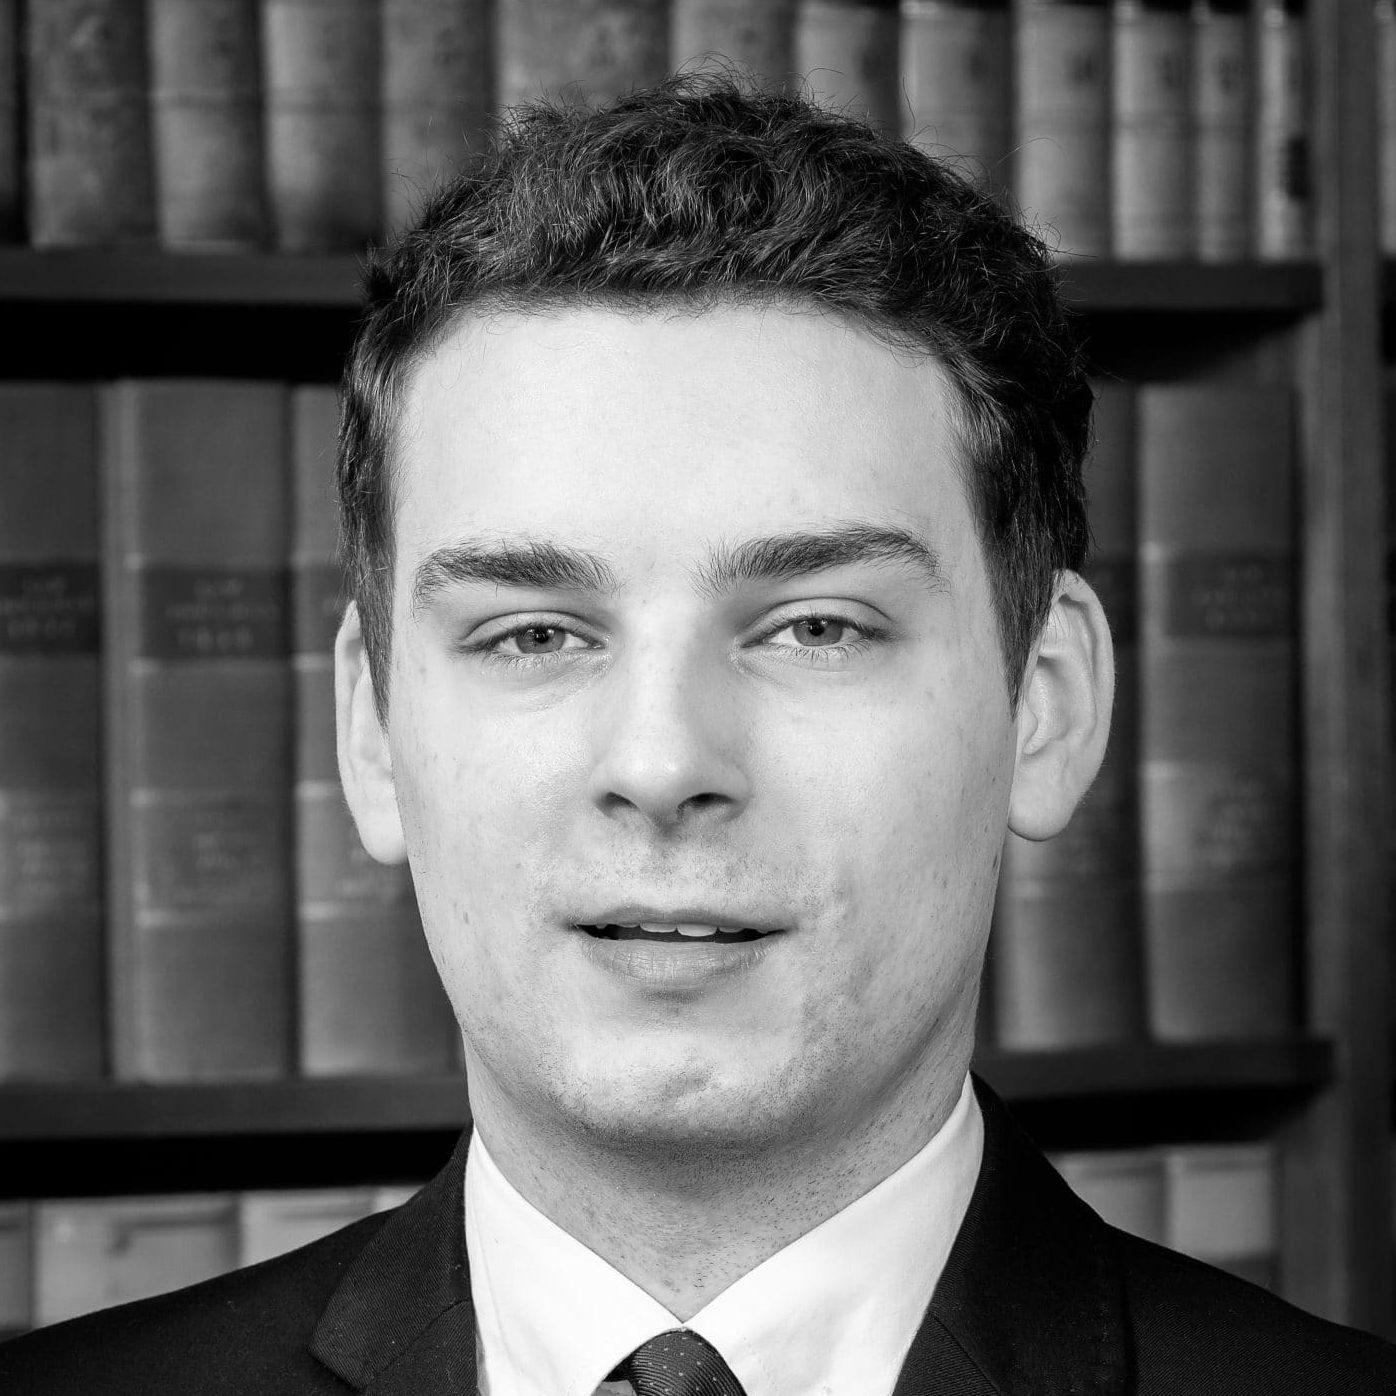 Headshot of Nick Hawkins - Solicitor at Everingham Solomons Tamworth